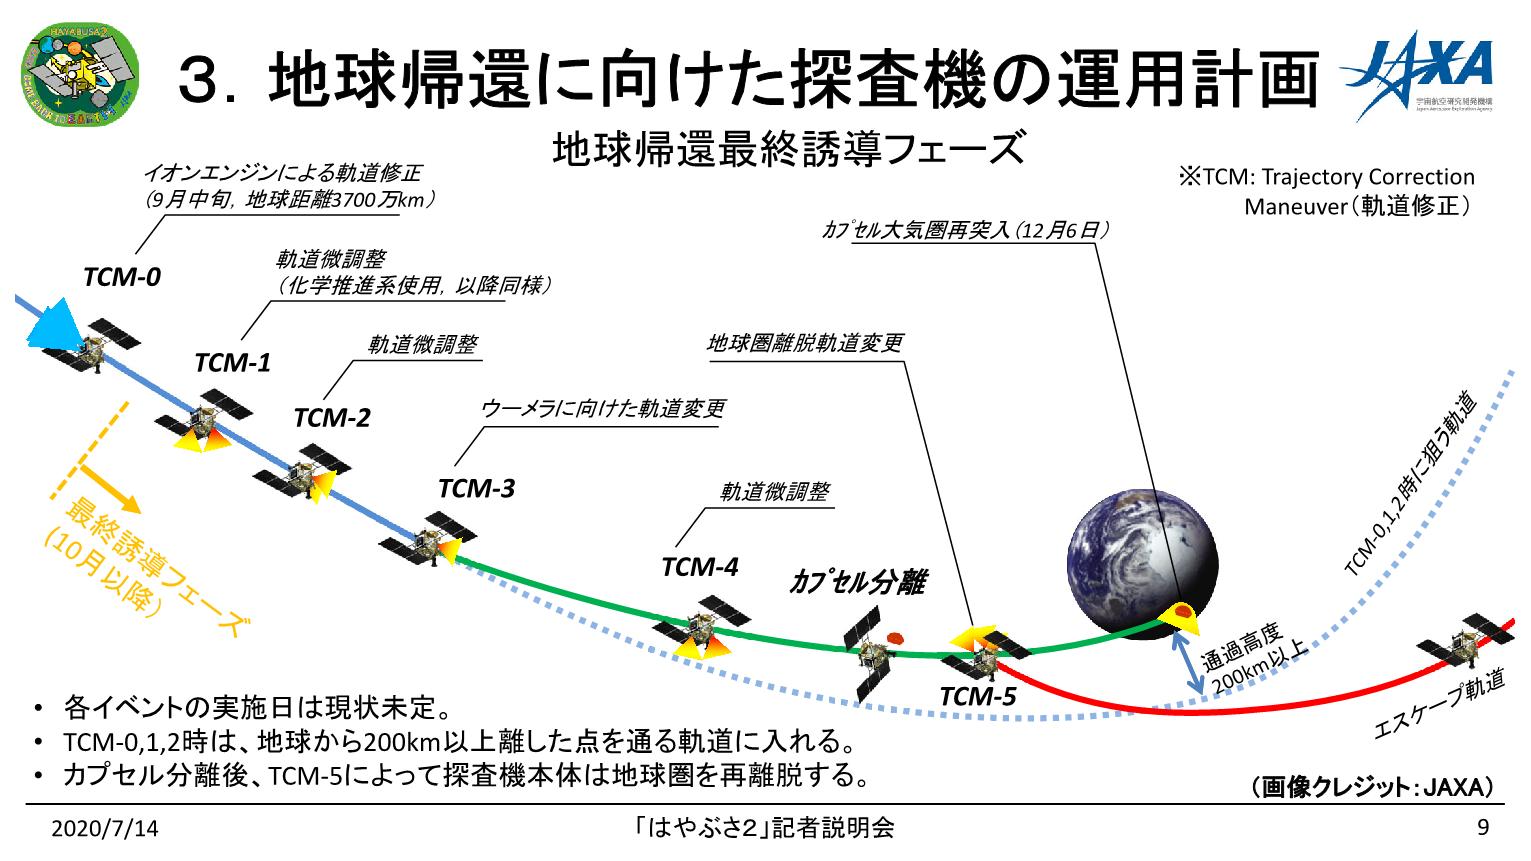 f:id:Imamura:20200714230253p:plain